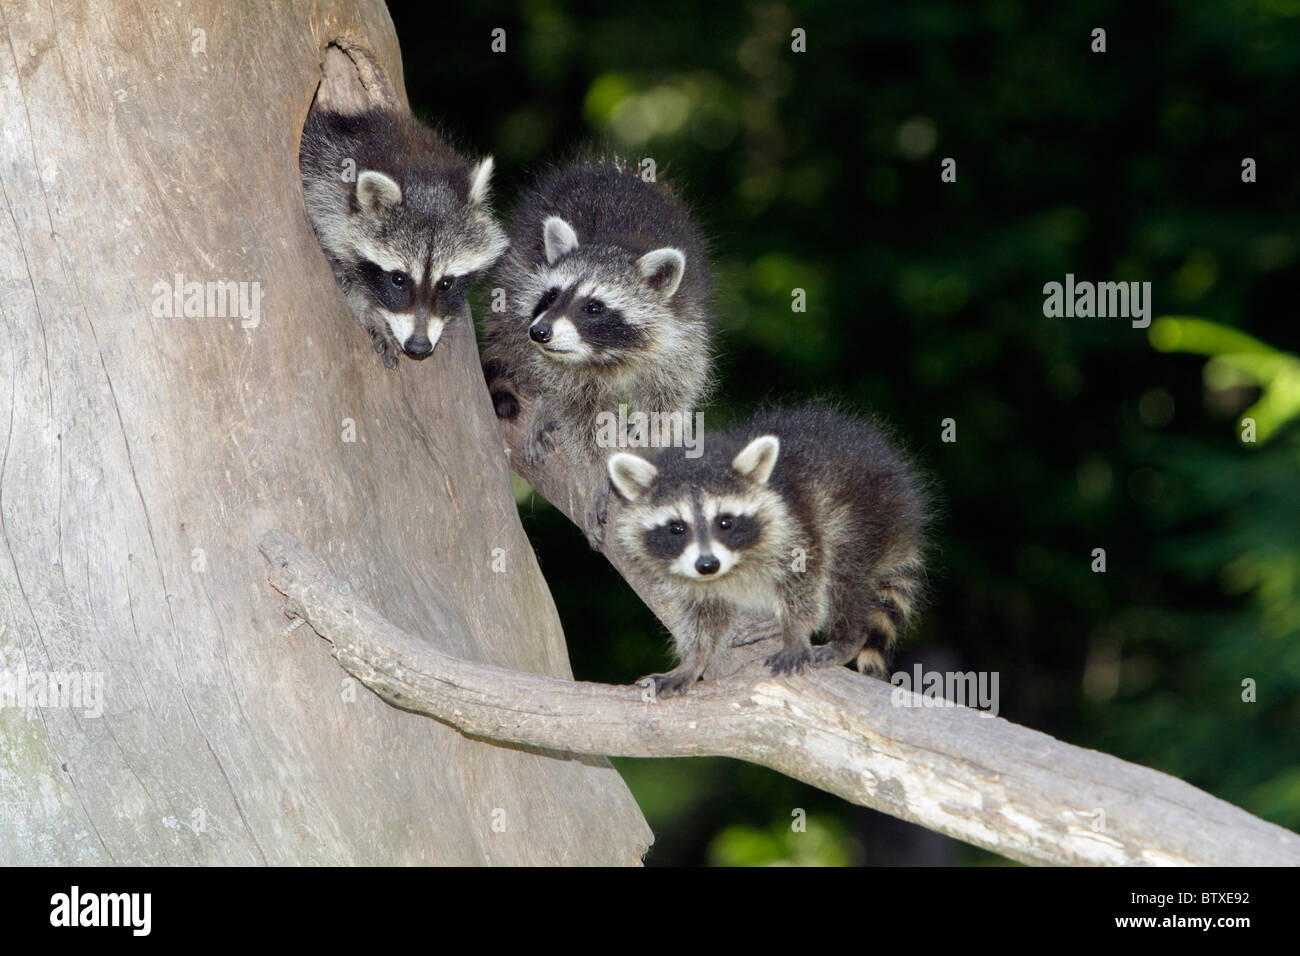 Mapache (Procyon lotor), tres animales bebe, sentado en frente de den entrada en tocón de árbol, Alemania Imagen De Stock